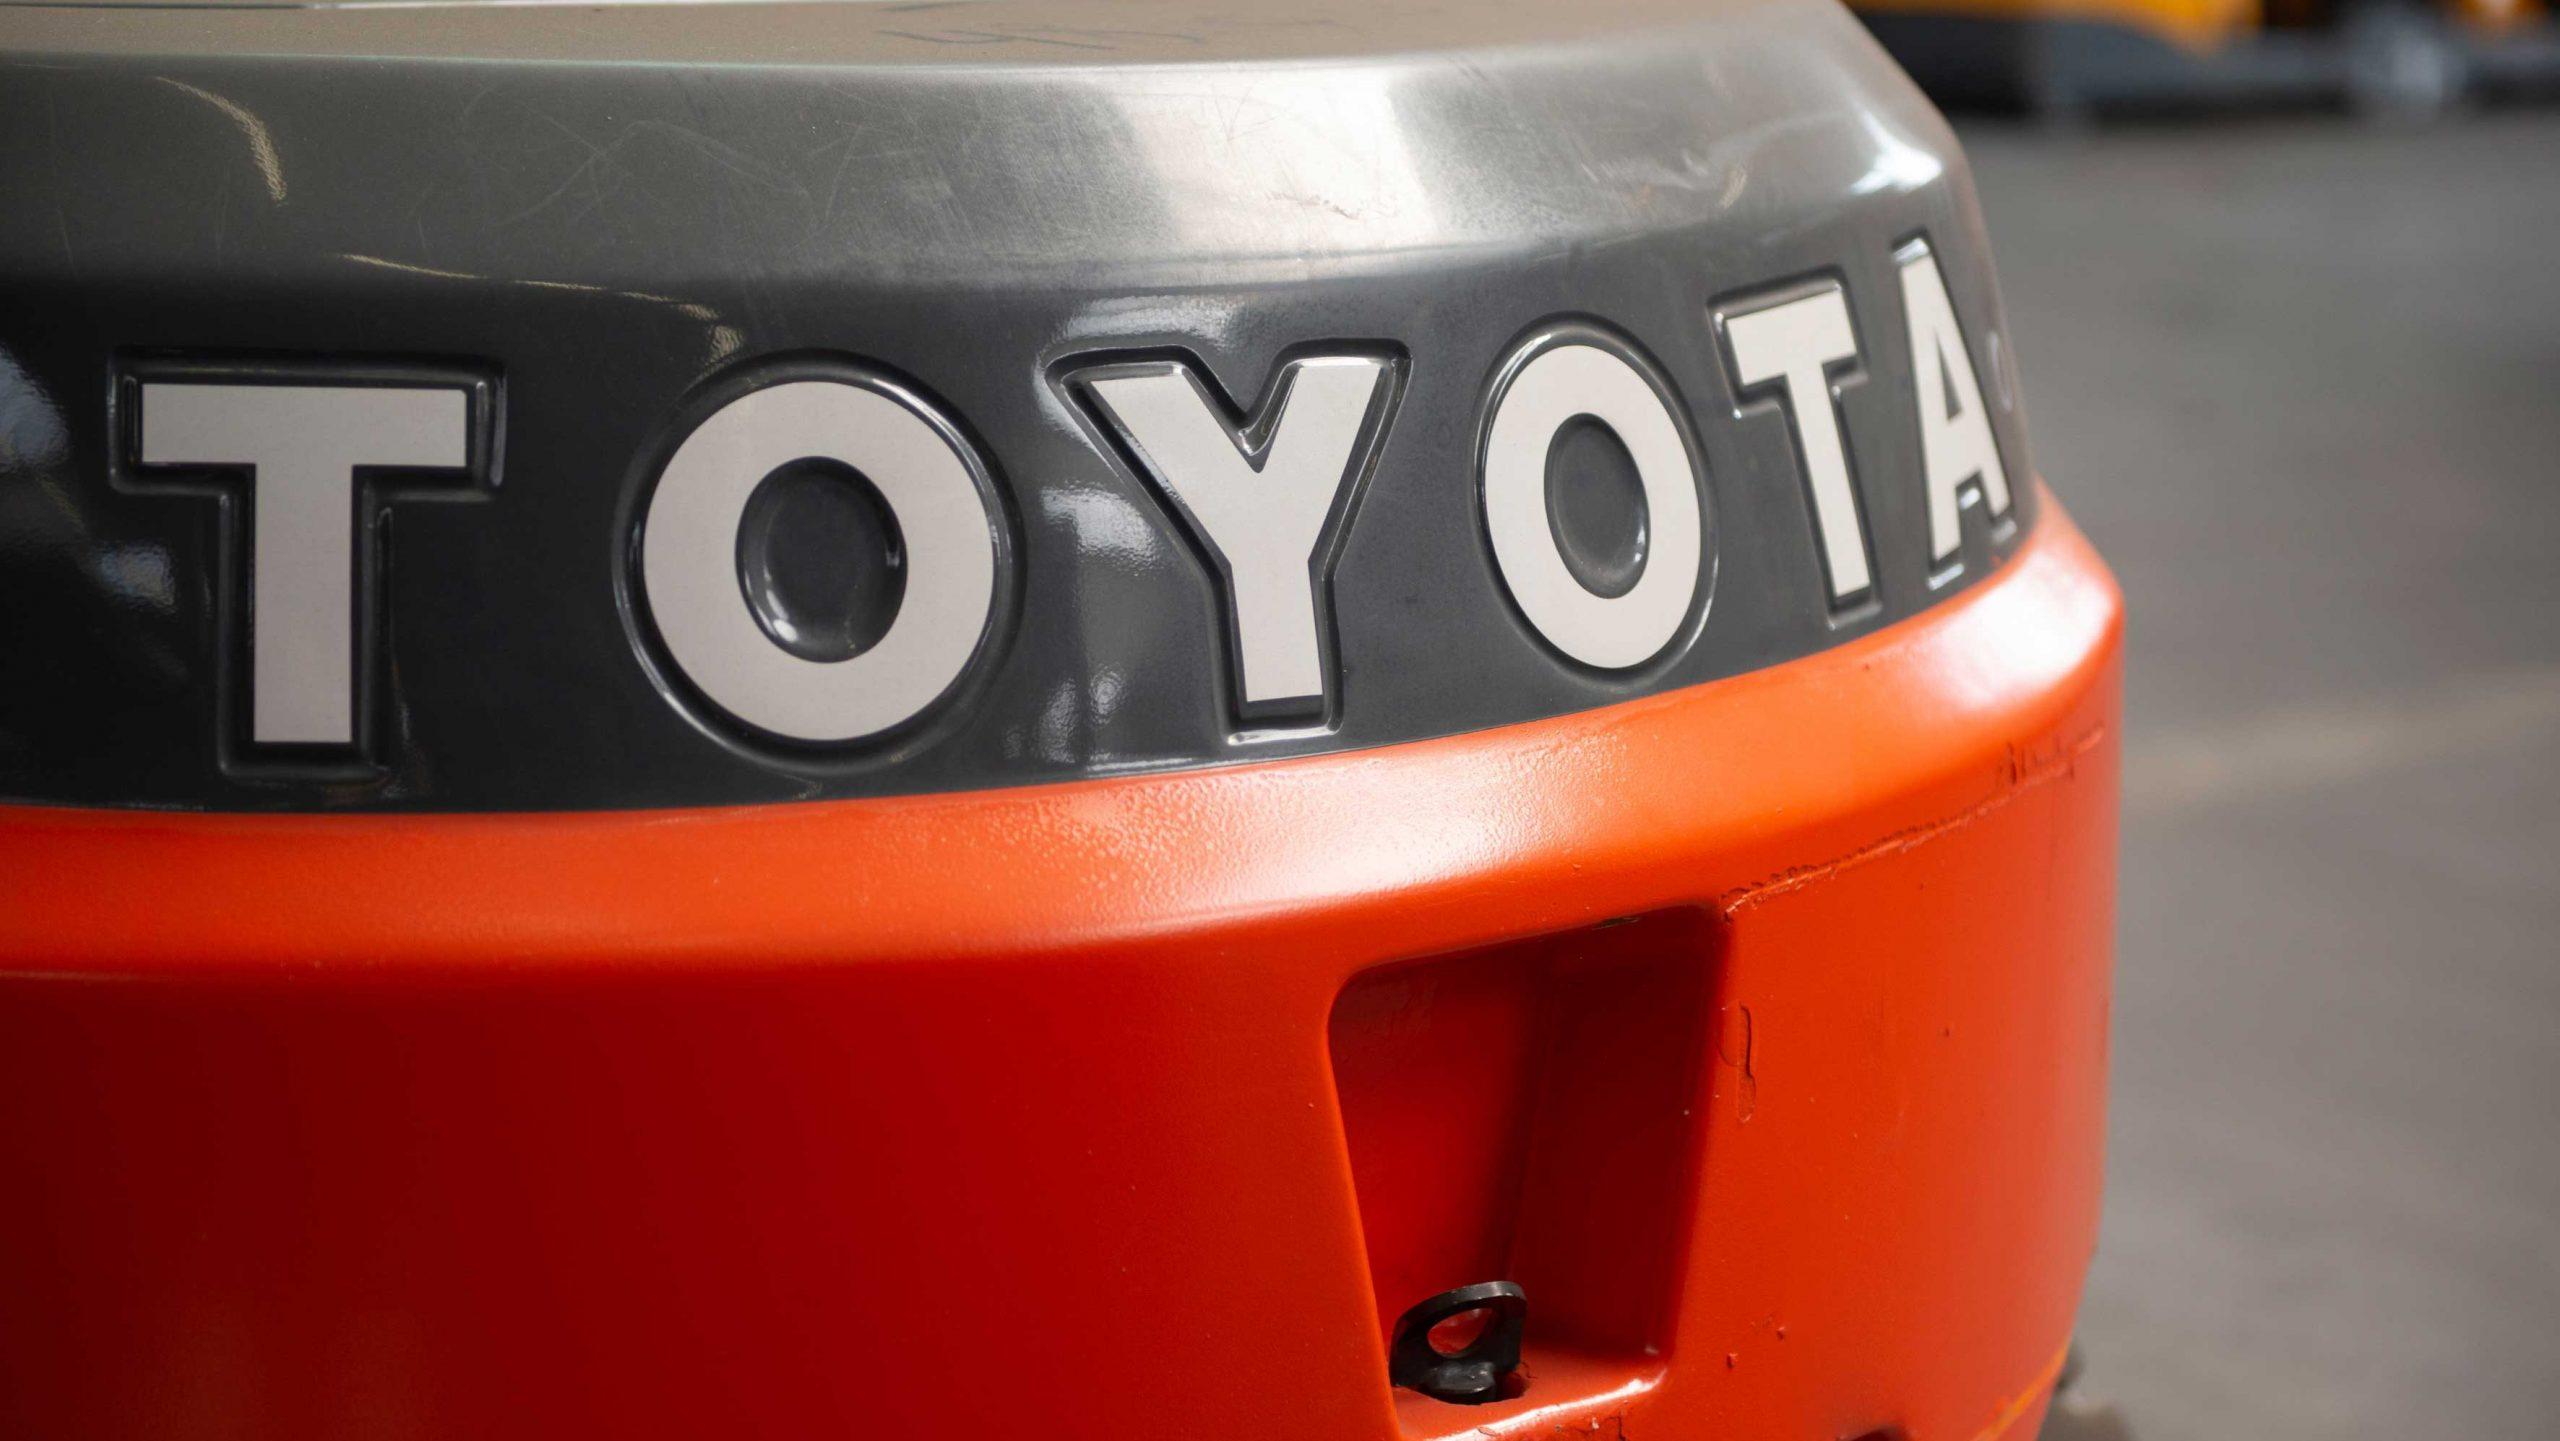 TRAFIK Bremen  - Toyota - BT carelli usati